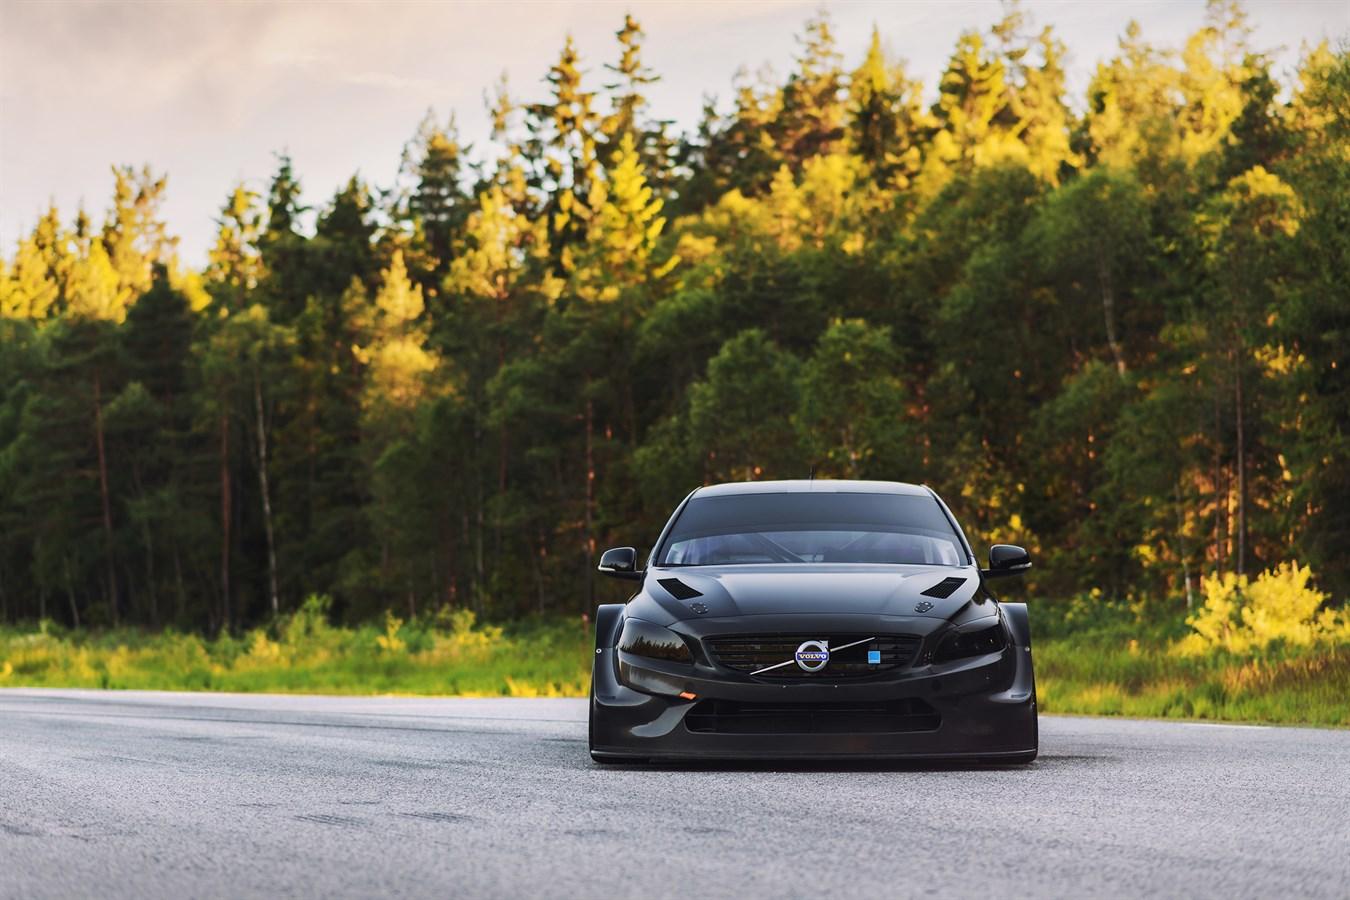 06eadb127b Polestar Cyan Racing announces multi-year FIA WTCC programme - Volvo Car  Group Global Media Newsroom